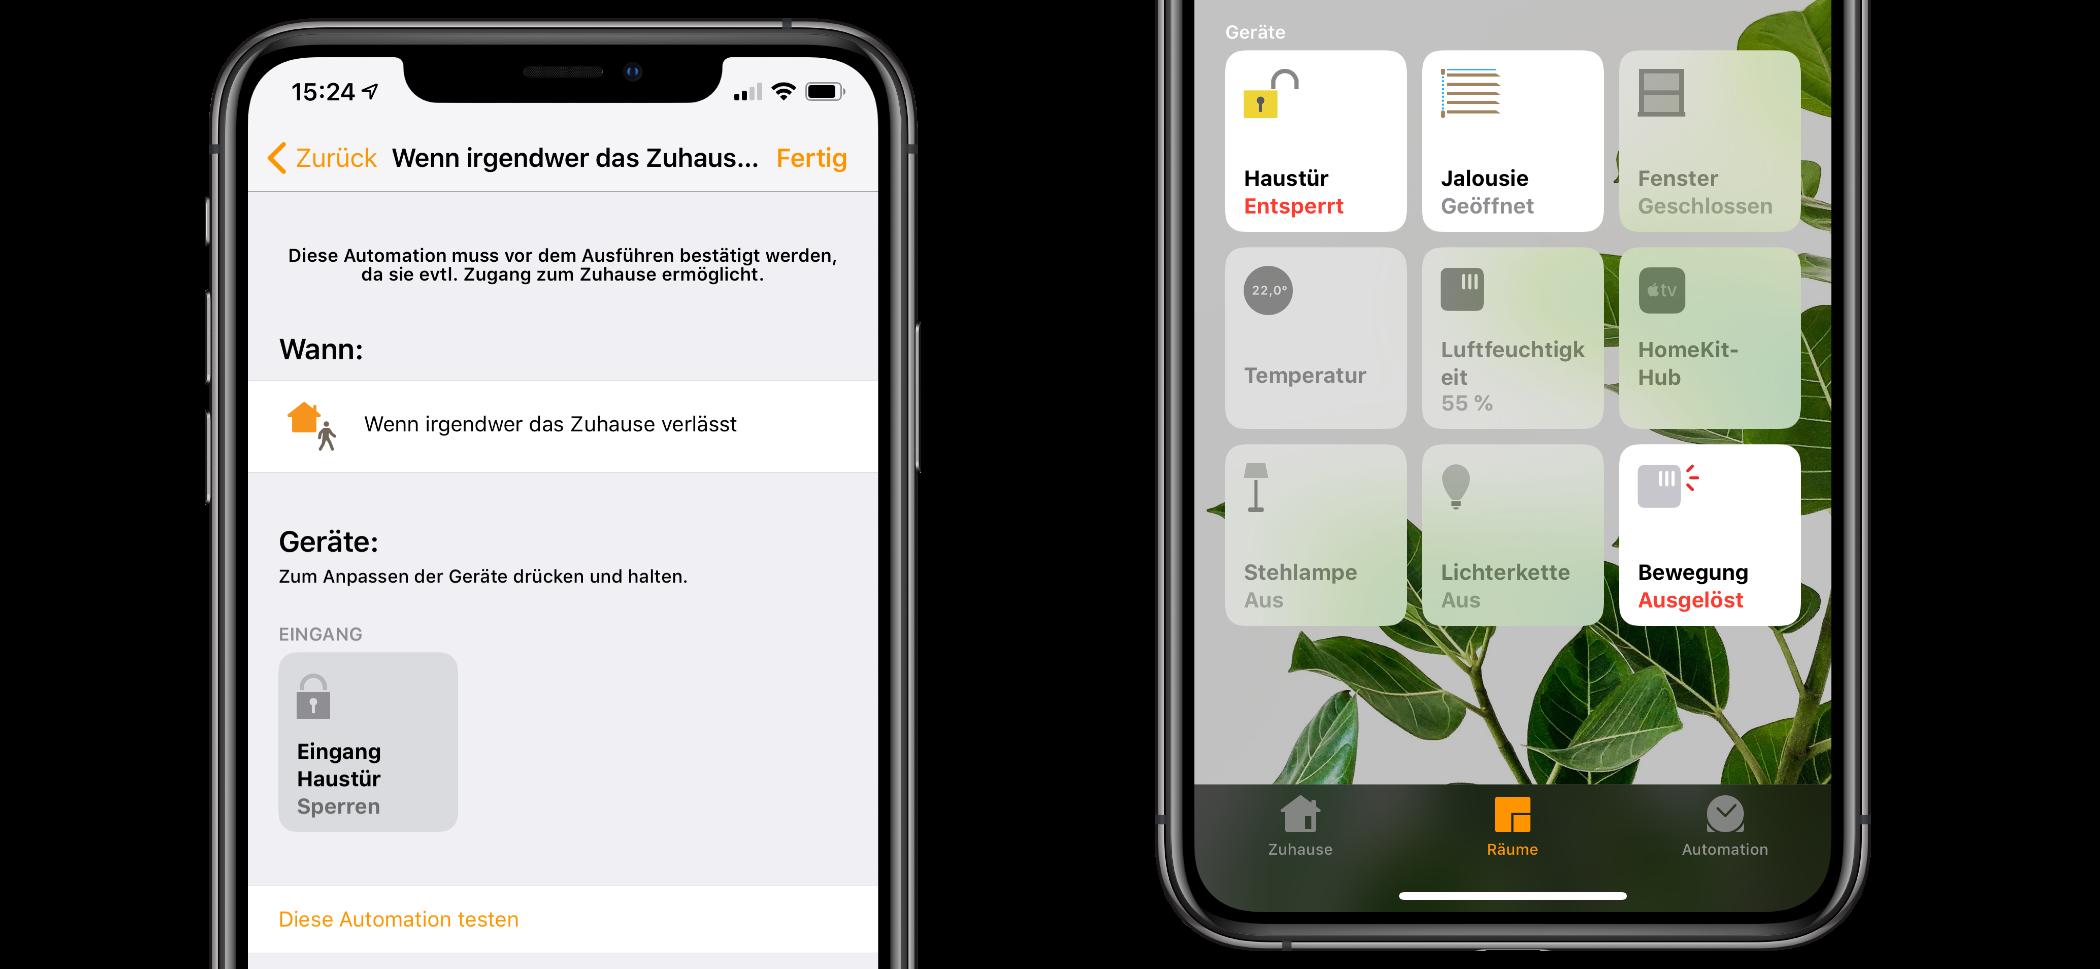 Nuki_HomeKit_Türschloss_SmartHome_Review6 Nuki 2.0 mit Apple HomeKit - das smarte Türschloss